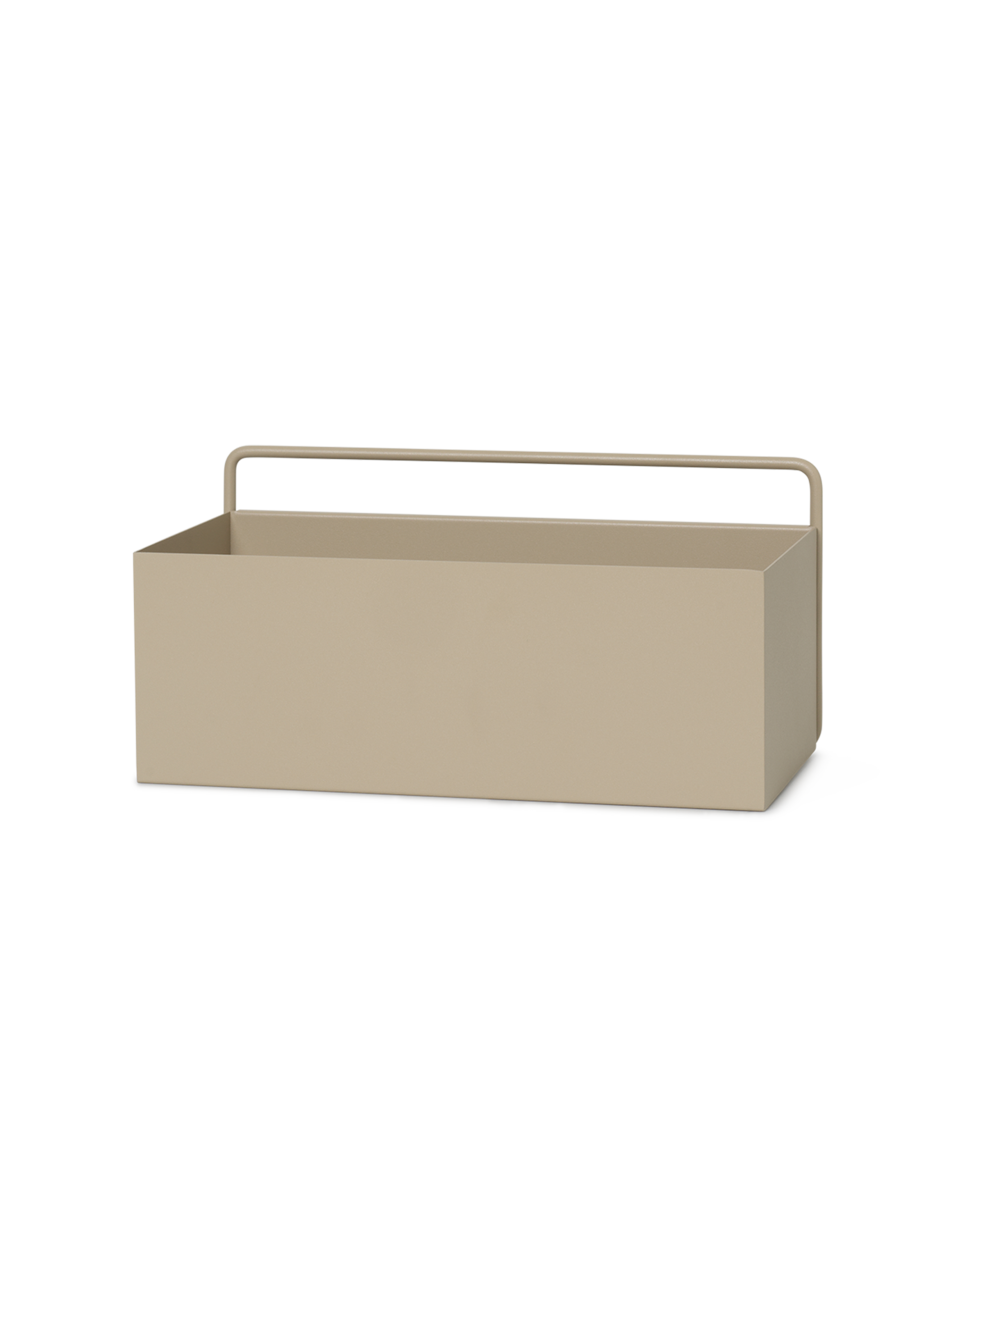 Ferm Living - Wall Box Regtangle - Cashmere (100540693)